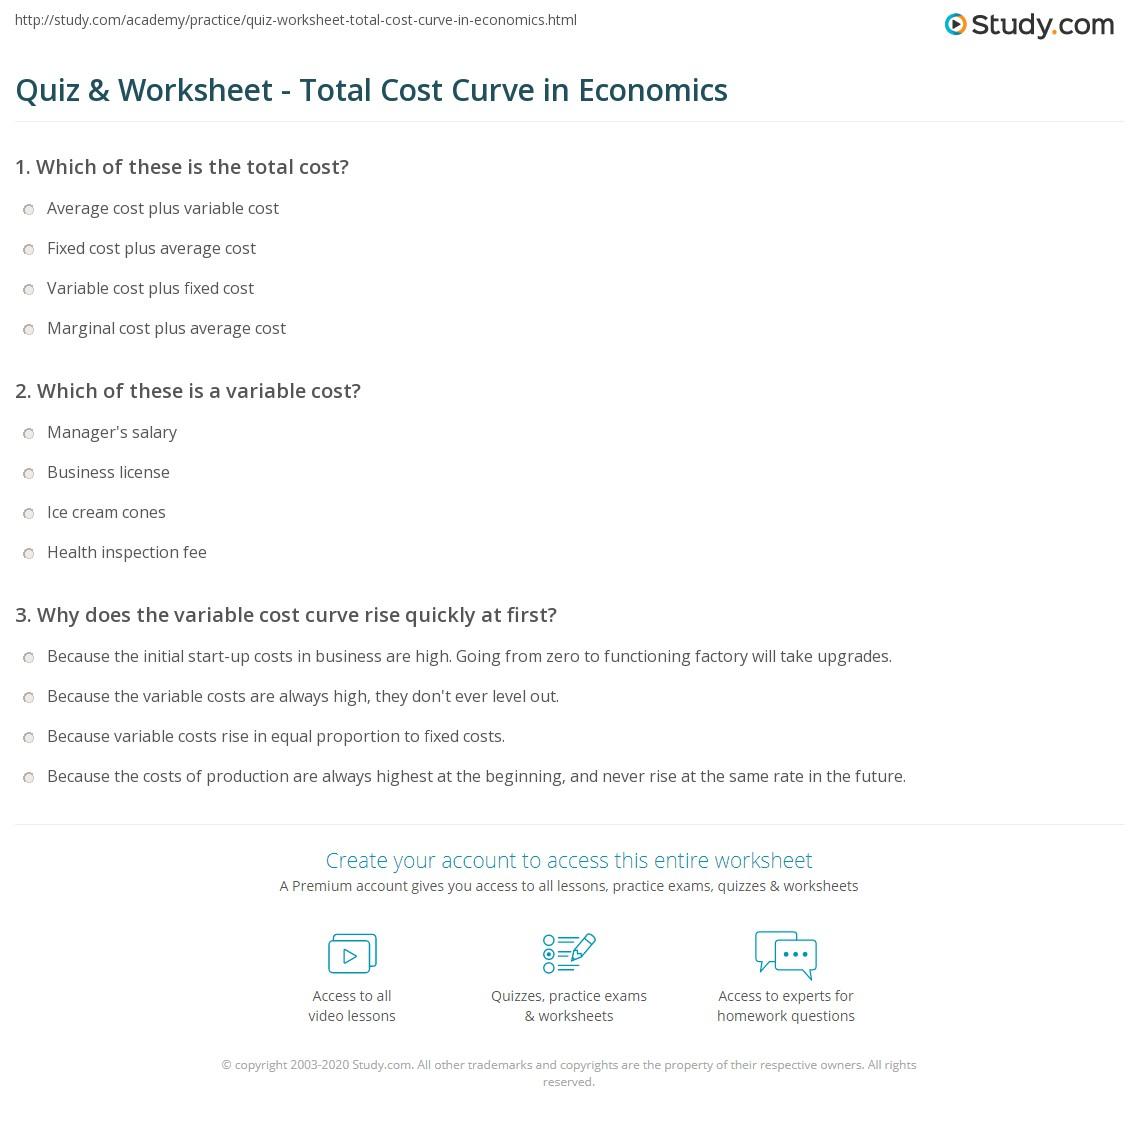 quiz worksheet total cost curve in economics. Black Bedroom Furniture Sets. Home Design Ideas